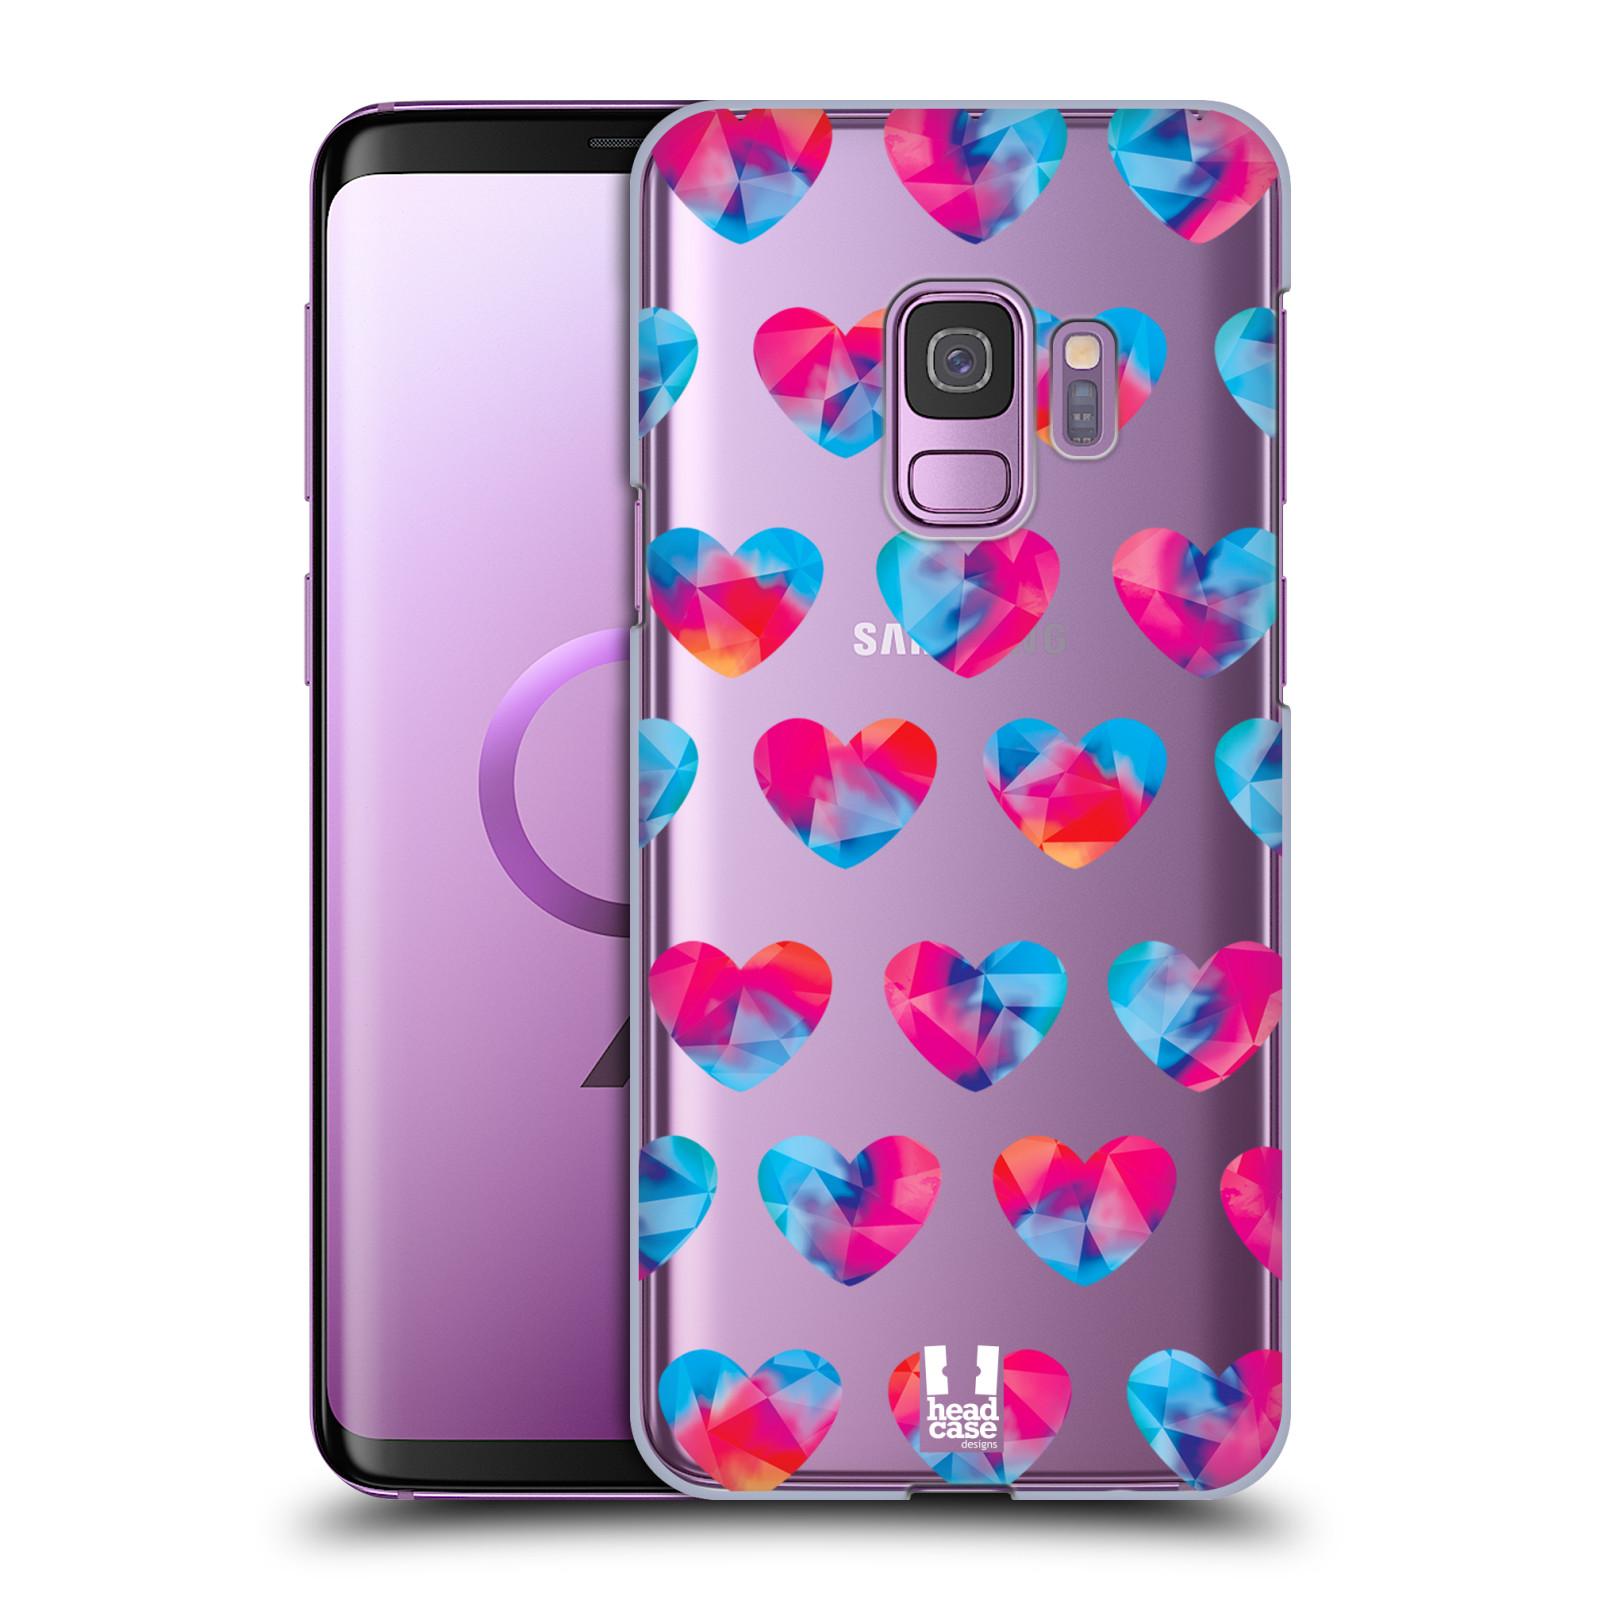 Plastové pouzdro na mobil Samsung Galaxy S9 - Head Case - Srdíčka hrající barvami